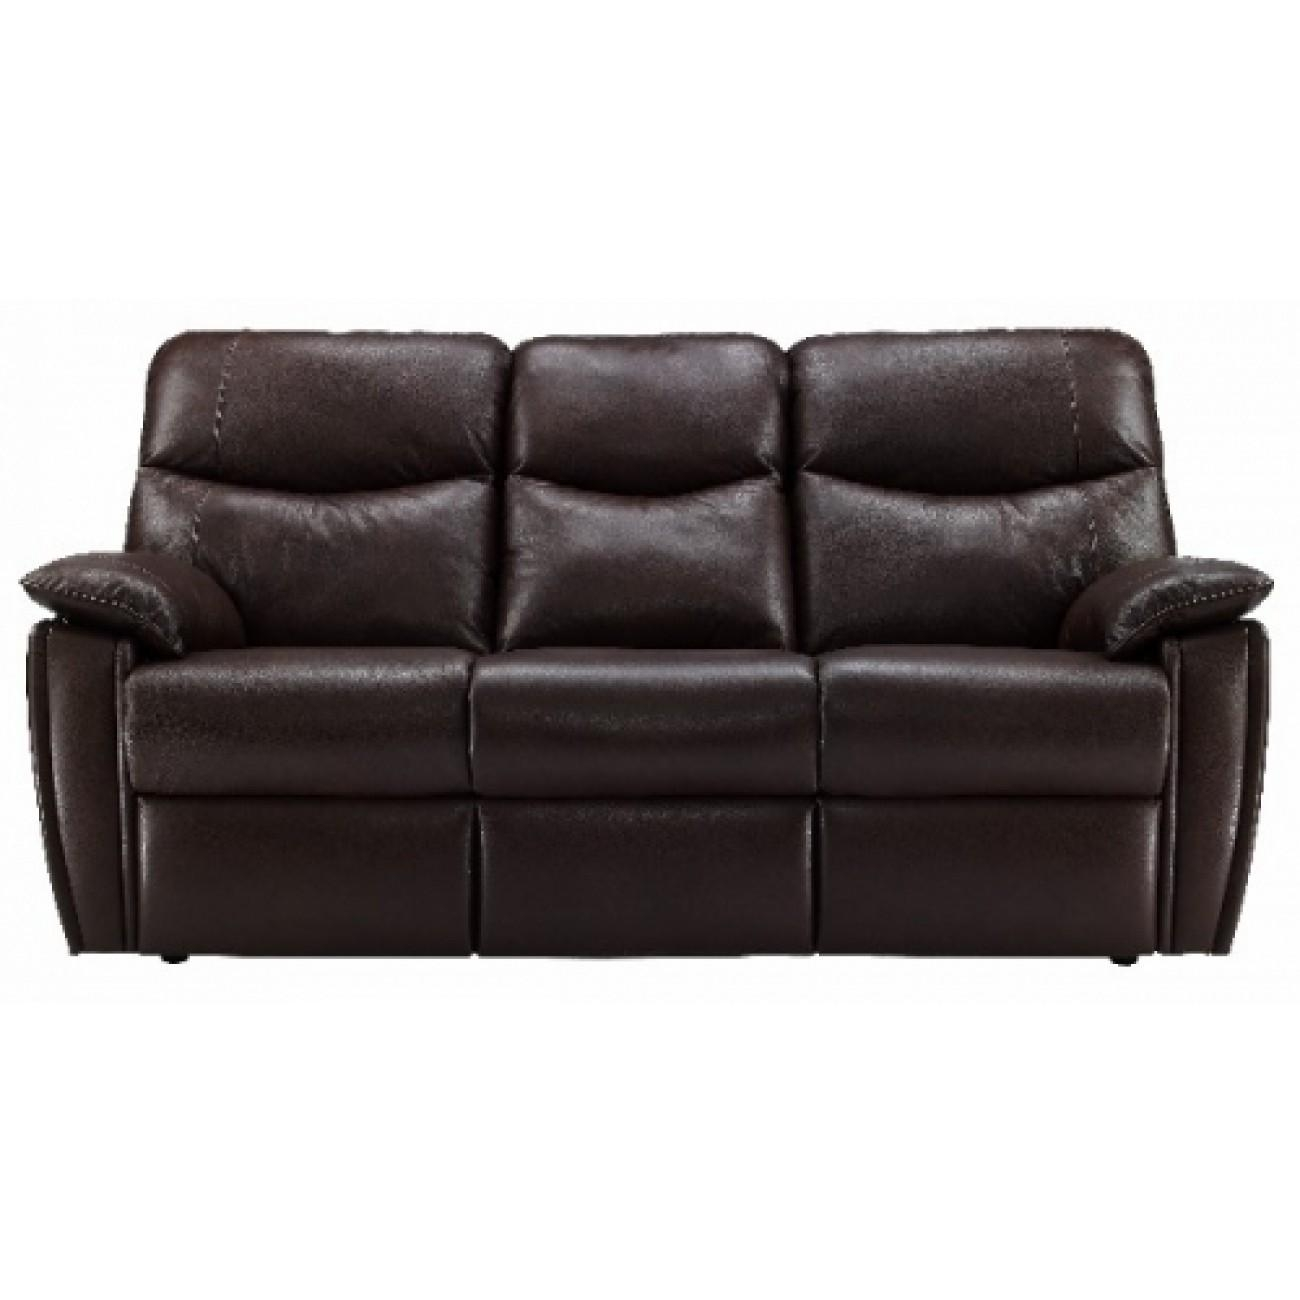 Sealy Sofa Leather Blend Sofa 1025theparty Thesofa